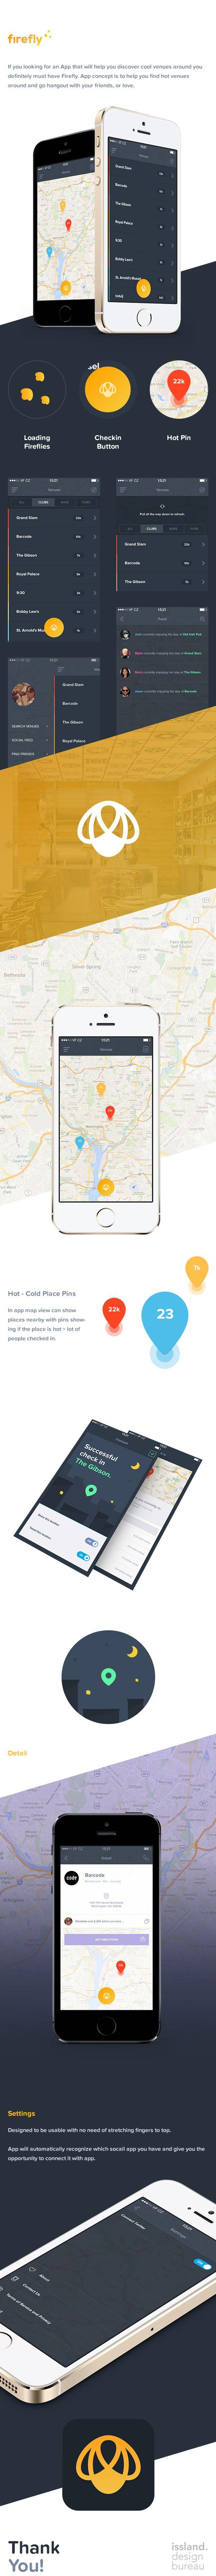 Firefly iOS App by Christine Isslander https://www.behance.net/gallery/Firefly-iOS-App/14801647